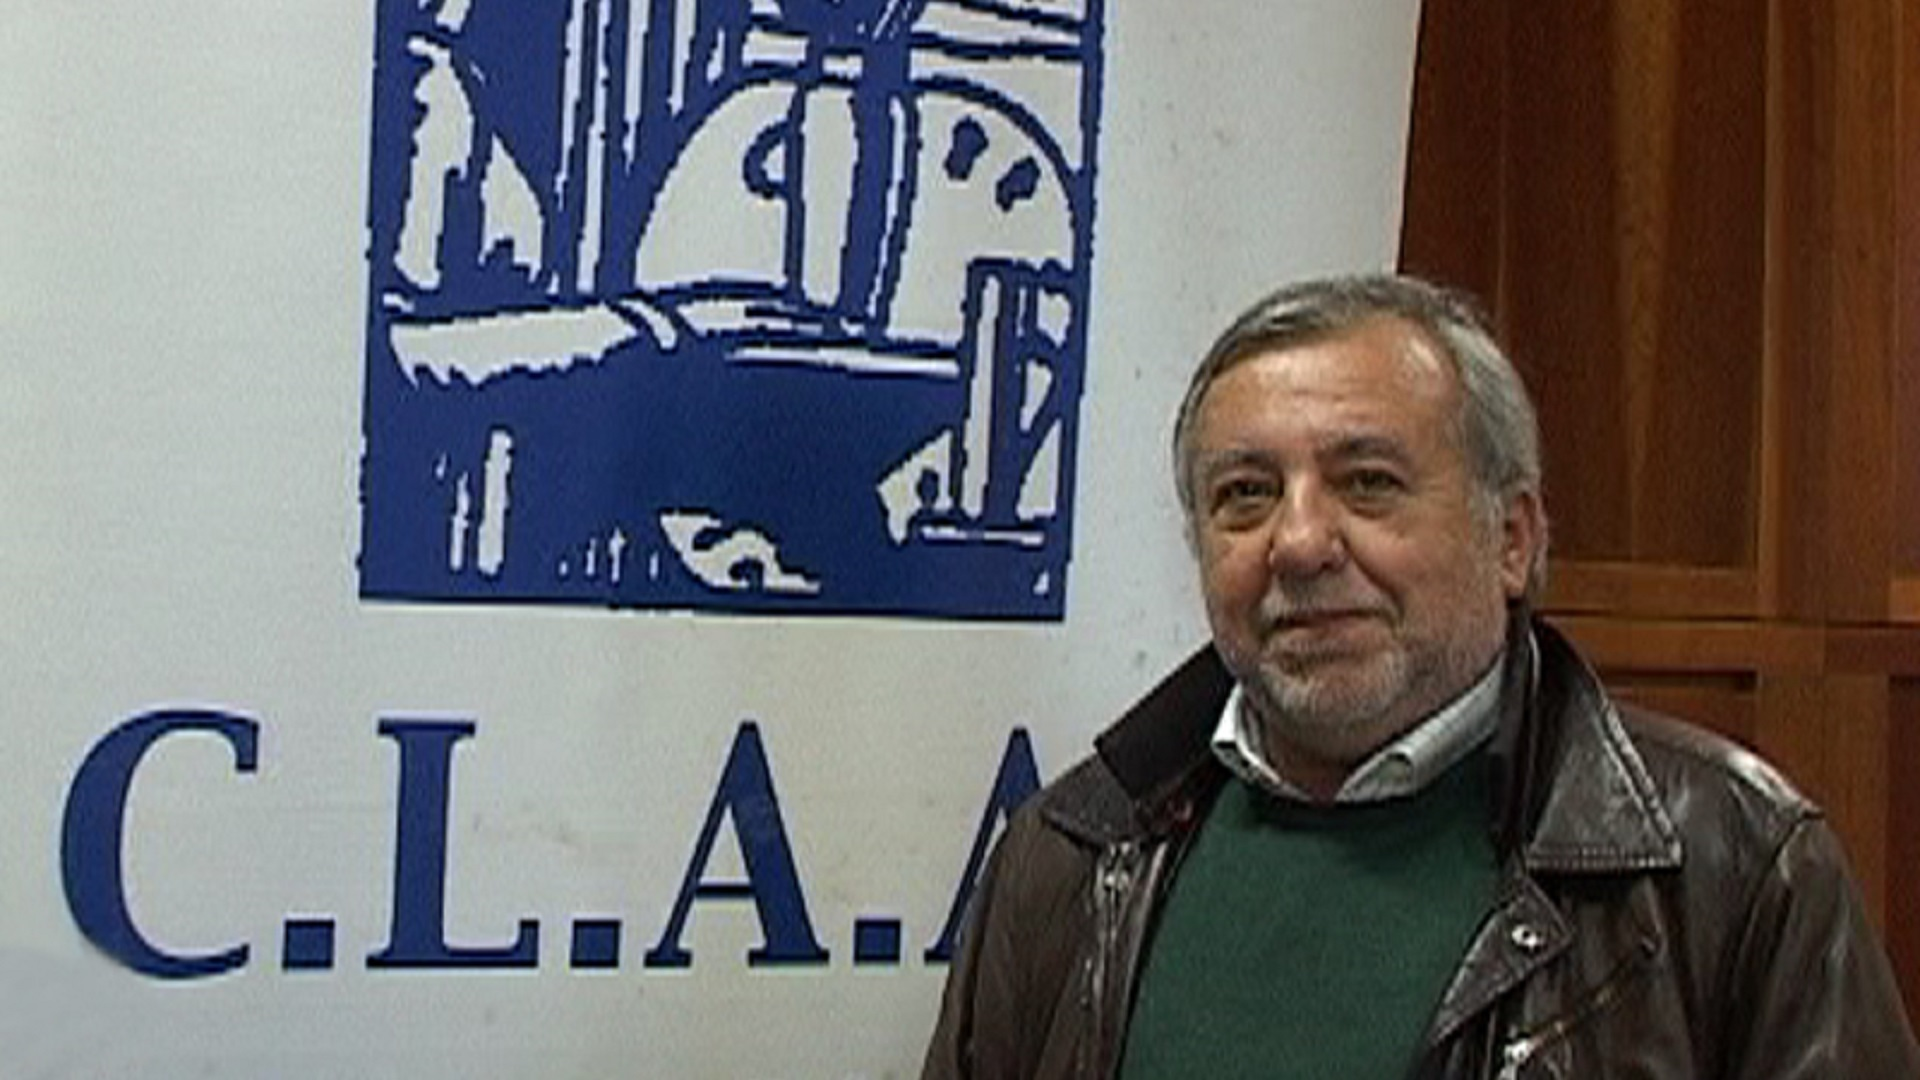 Gianfranco-Ferrigno-Presidente-CLAAI-2